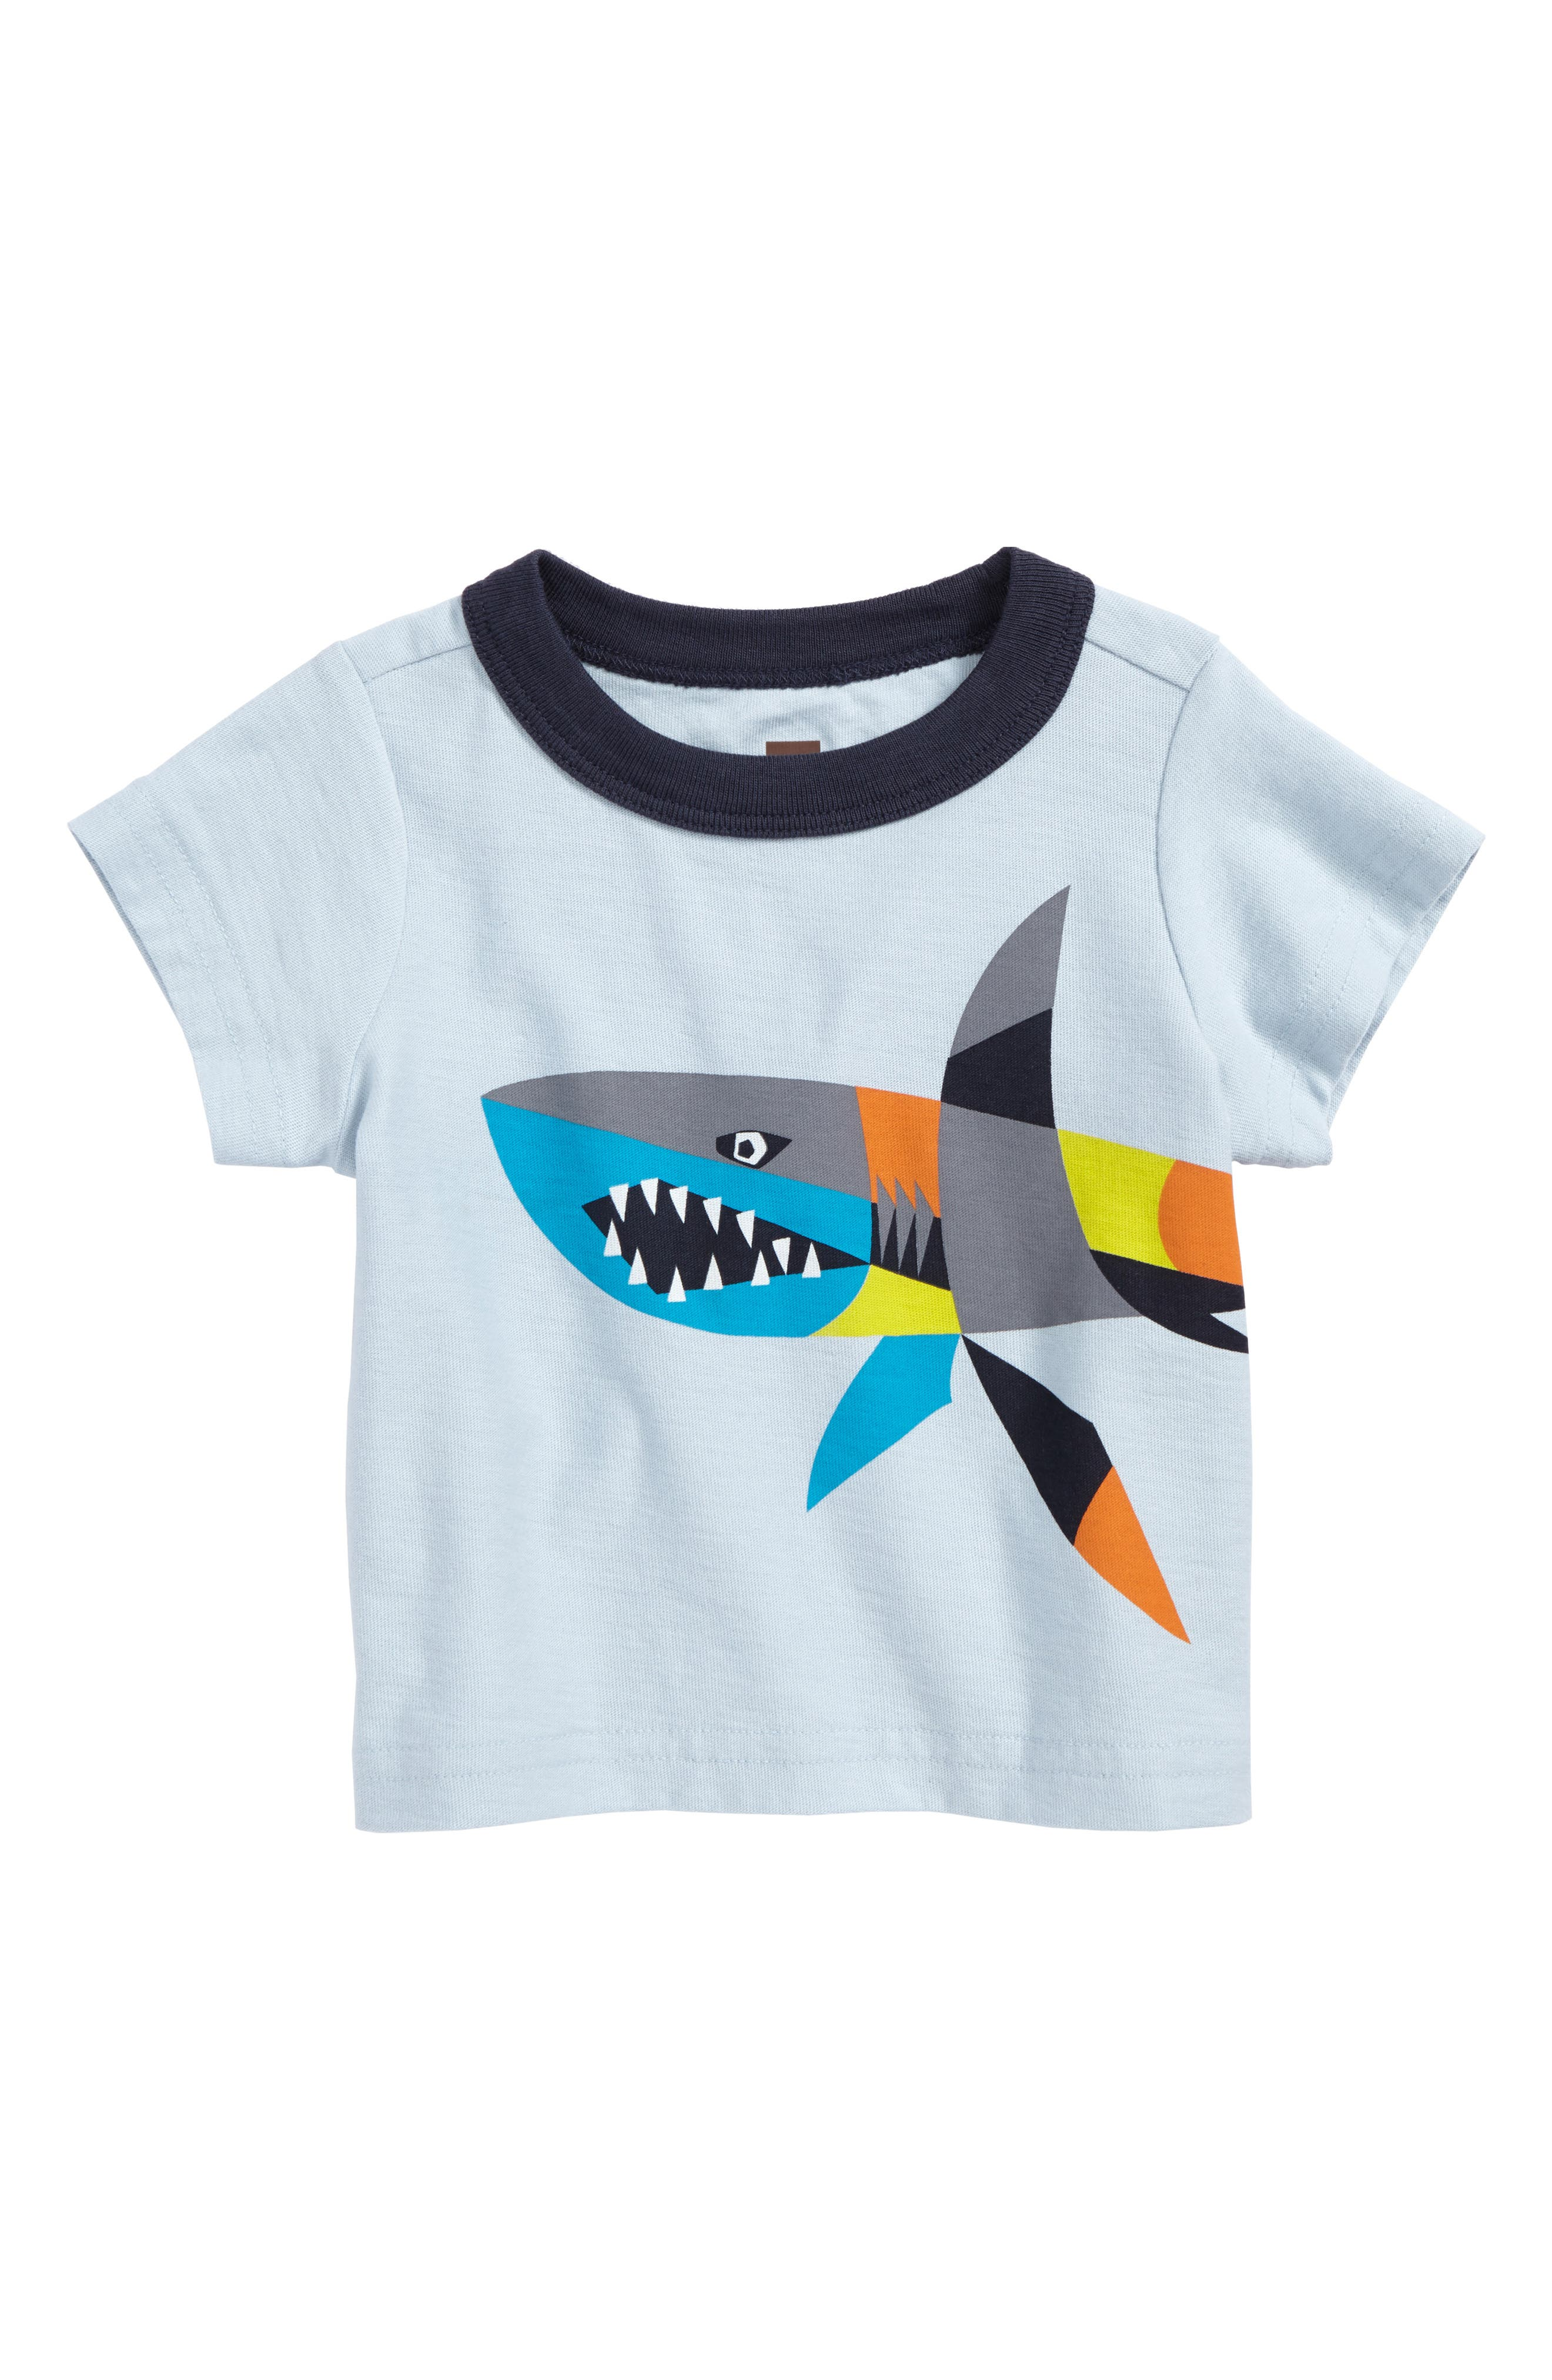 Main Image - Tea Collection Chomper T-Shirt (Baby Boys)